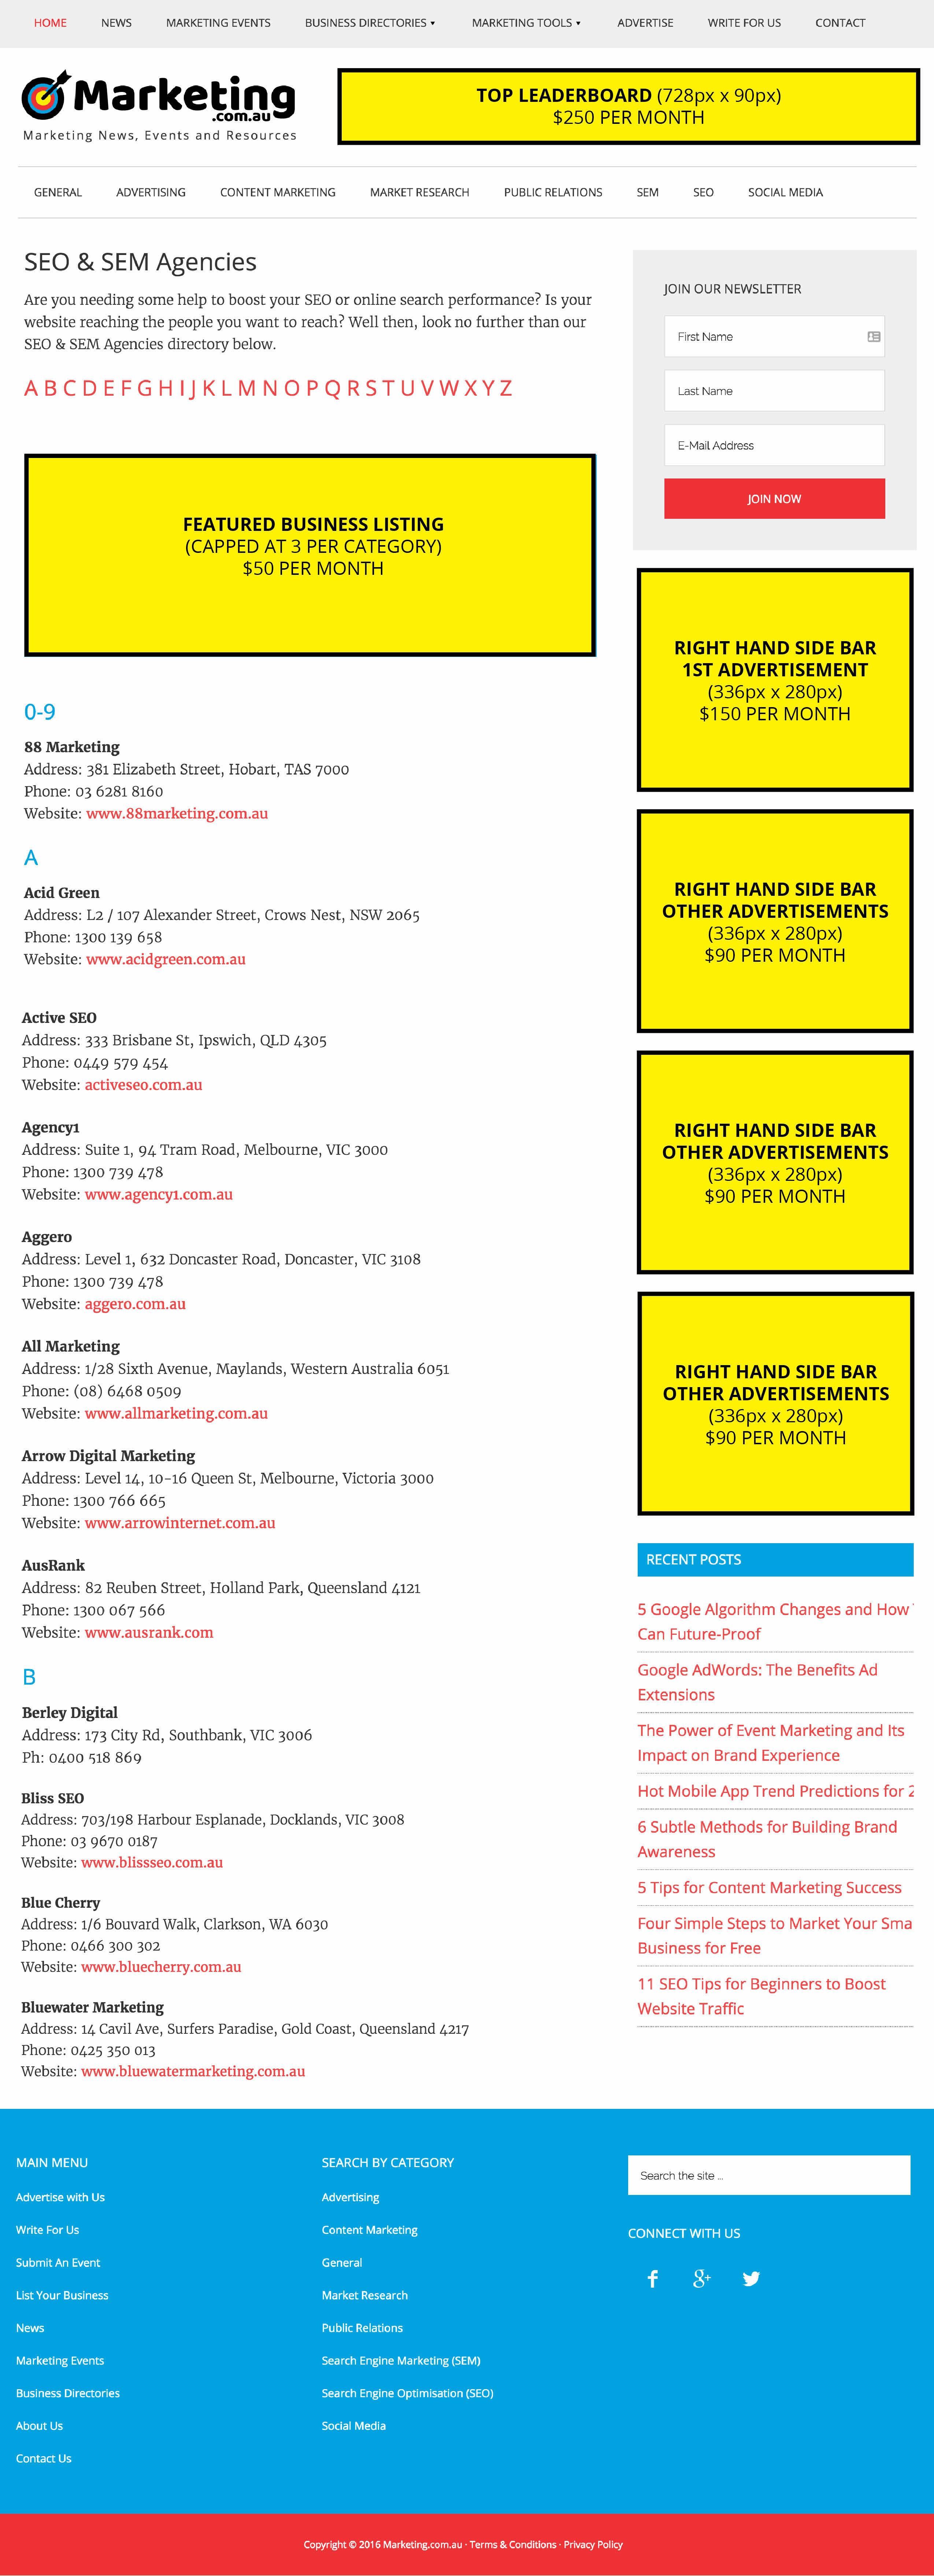 marketing com au media kit business listing